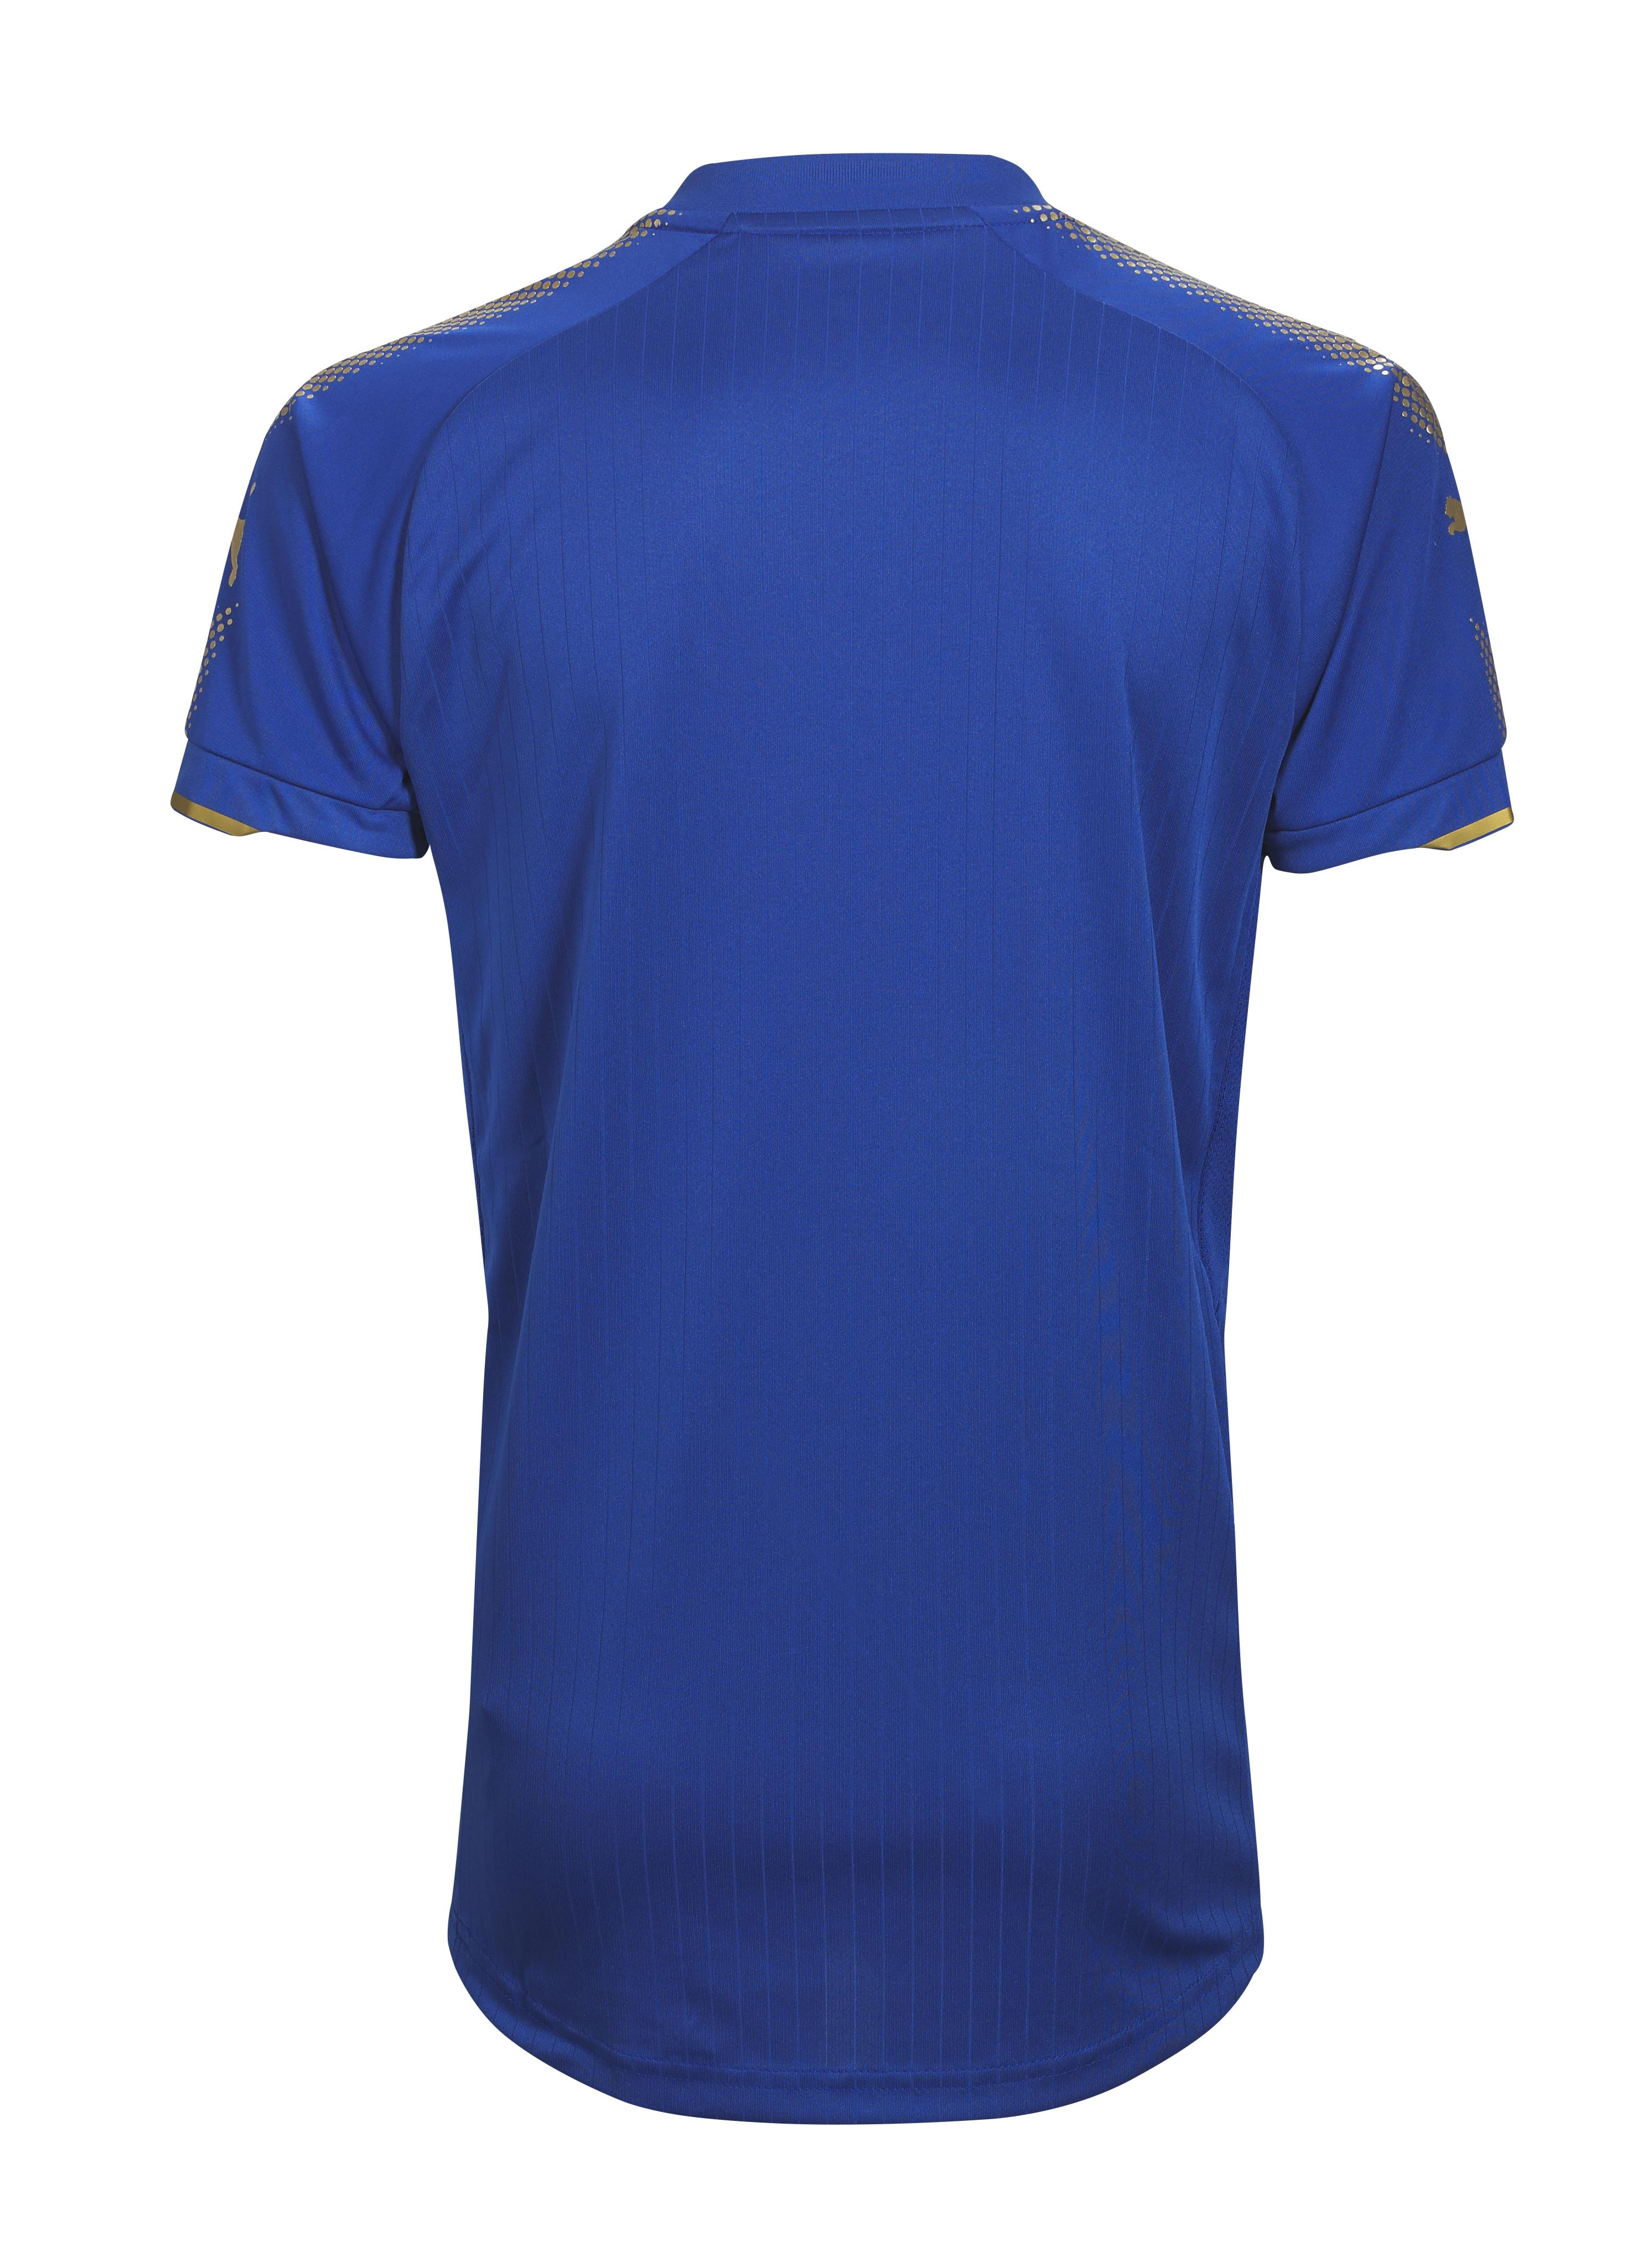 ee247b8c15c 2017-2018 Leicester City Puma Home Football Shirt  K1963001R  - Uksoccershop